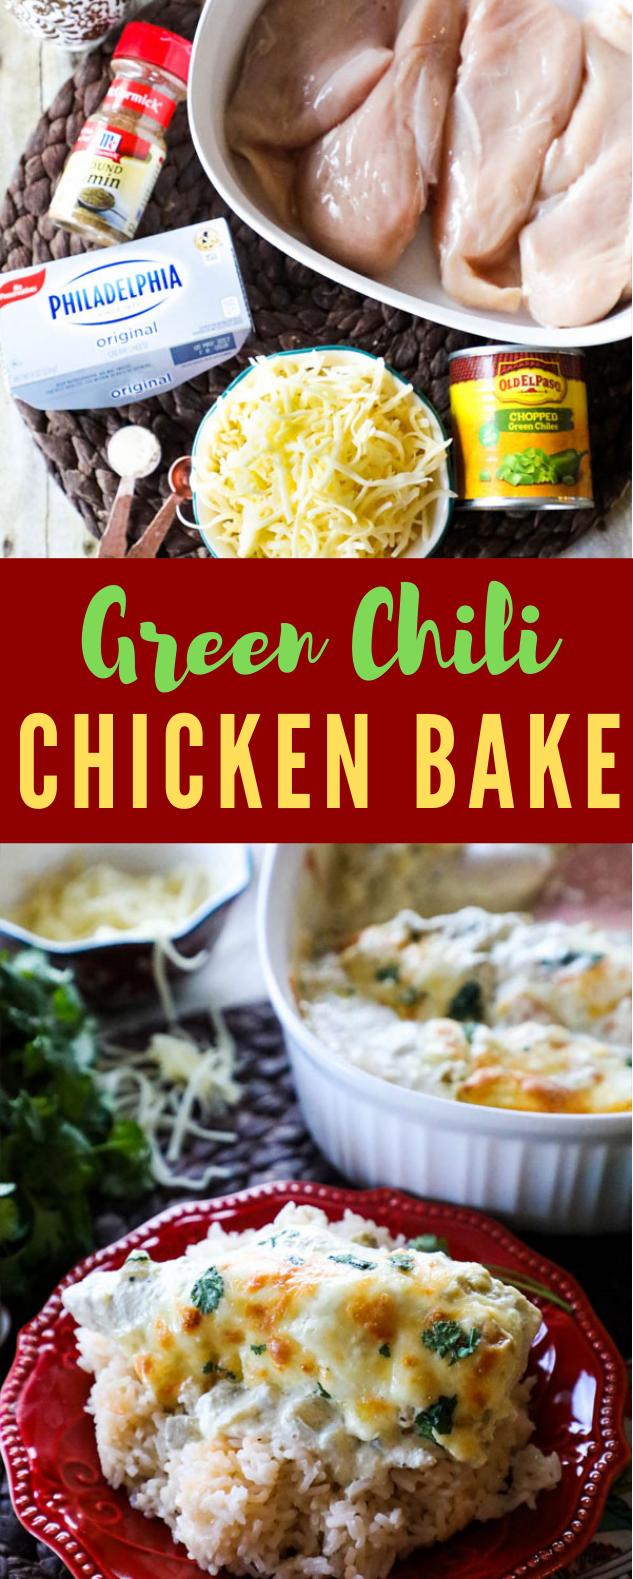 GREEN CHILI CHICKEN BAKE RECIPE #Dinner #Crockpot